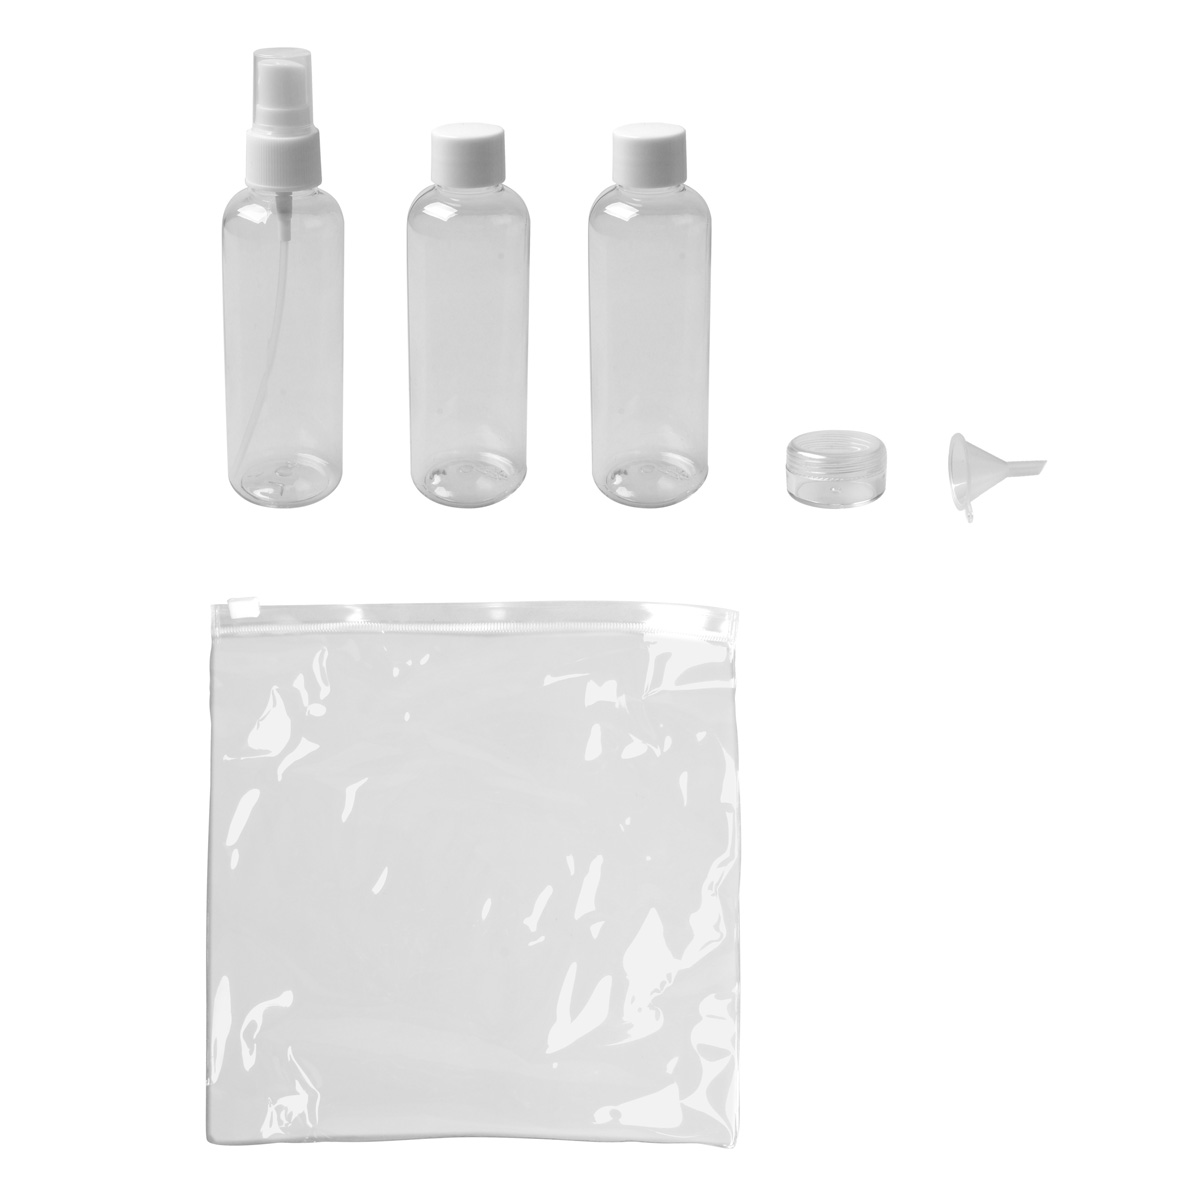 handgep ck board beutel flaschen. Black Bedroom Furniture Sets. Home Design Ideas